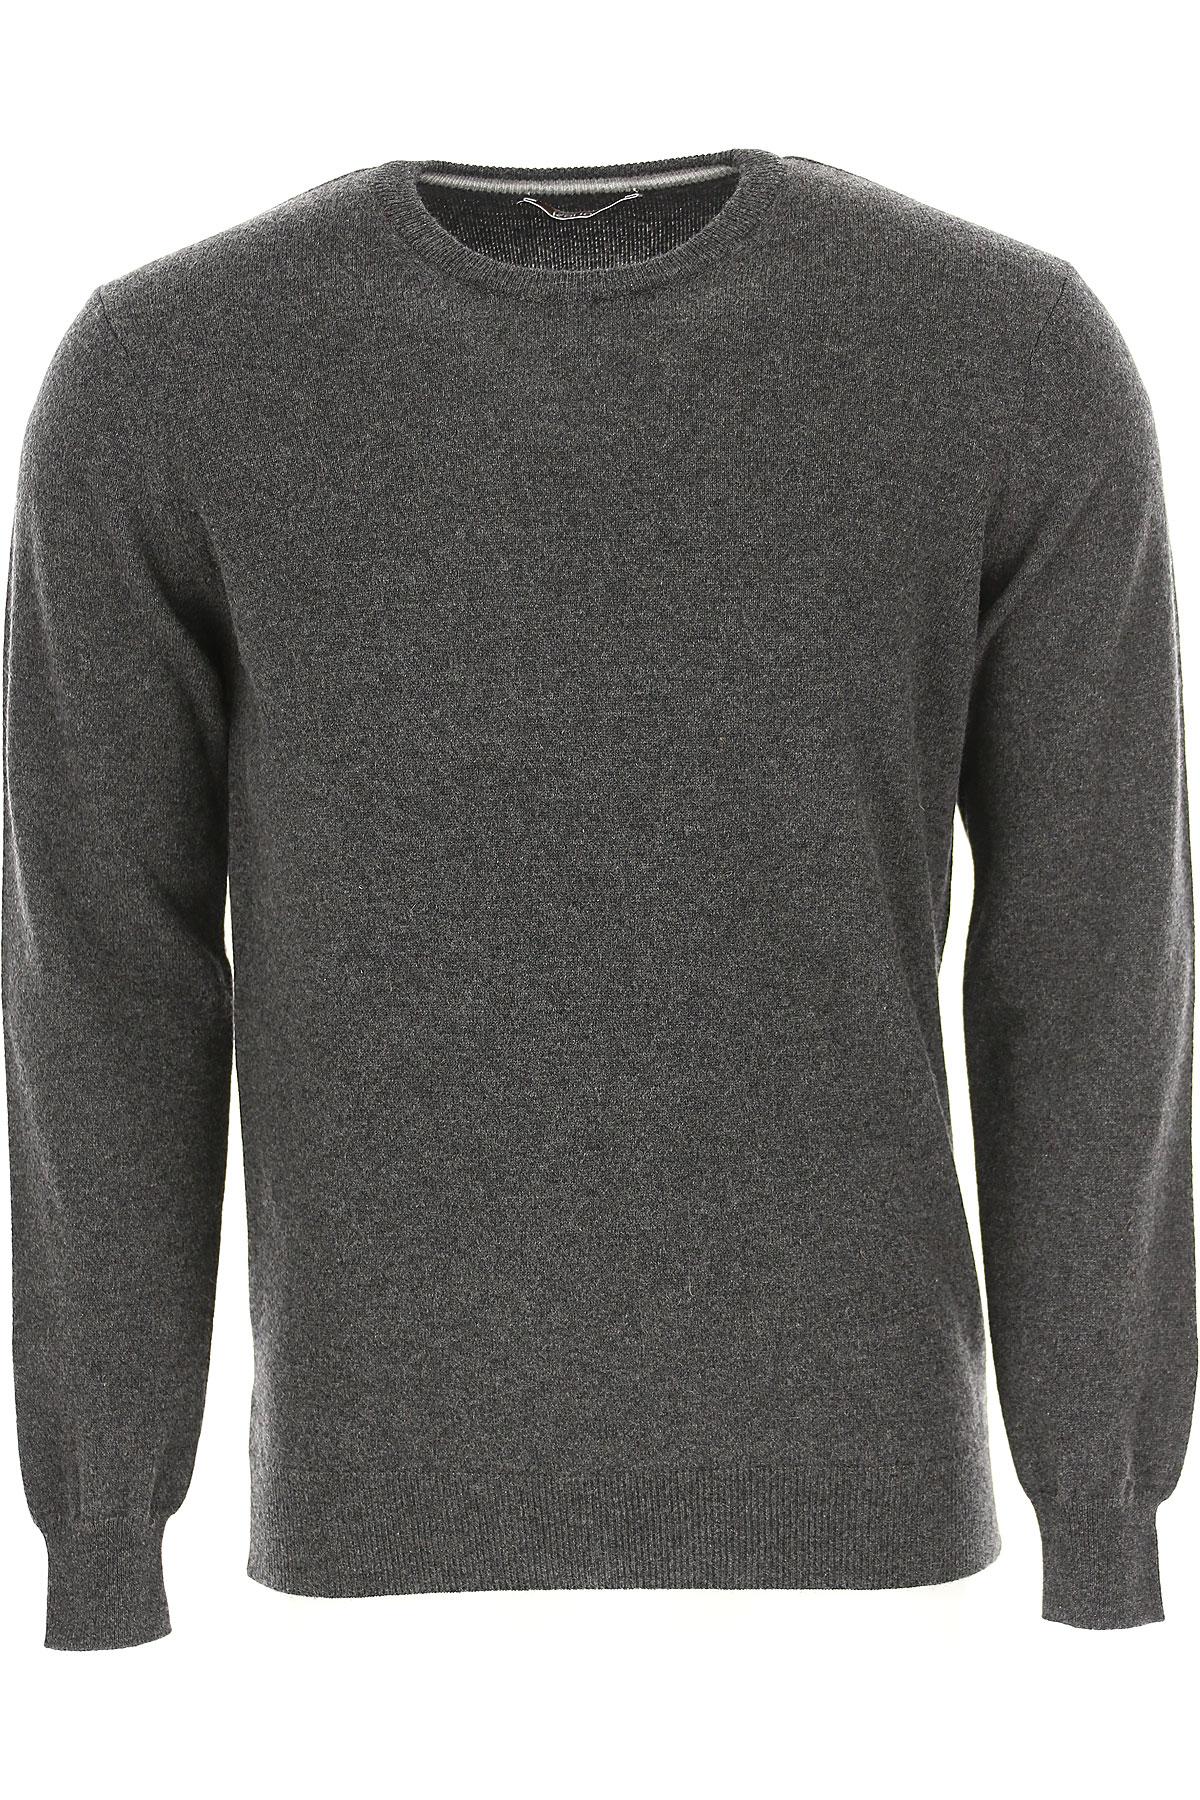 Kangra Sweater for Men Jumper On Sale, antracite, Cashemere, 2019, M XL